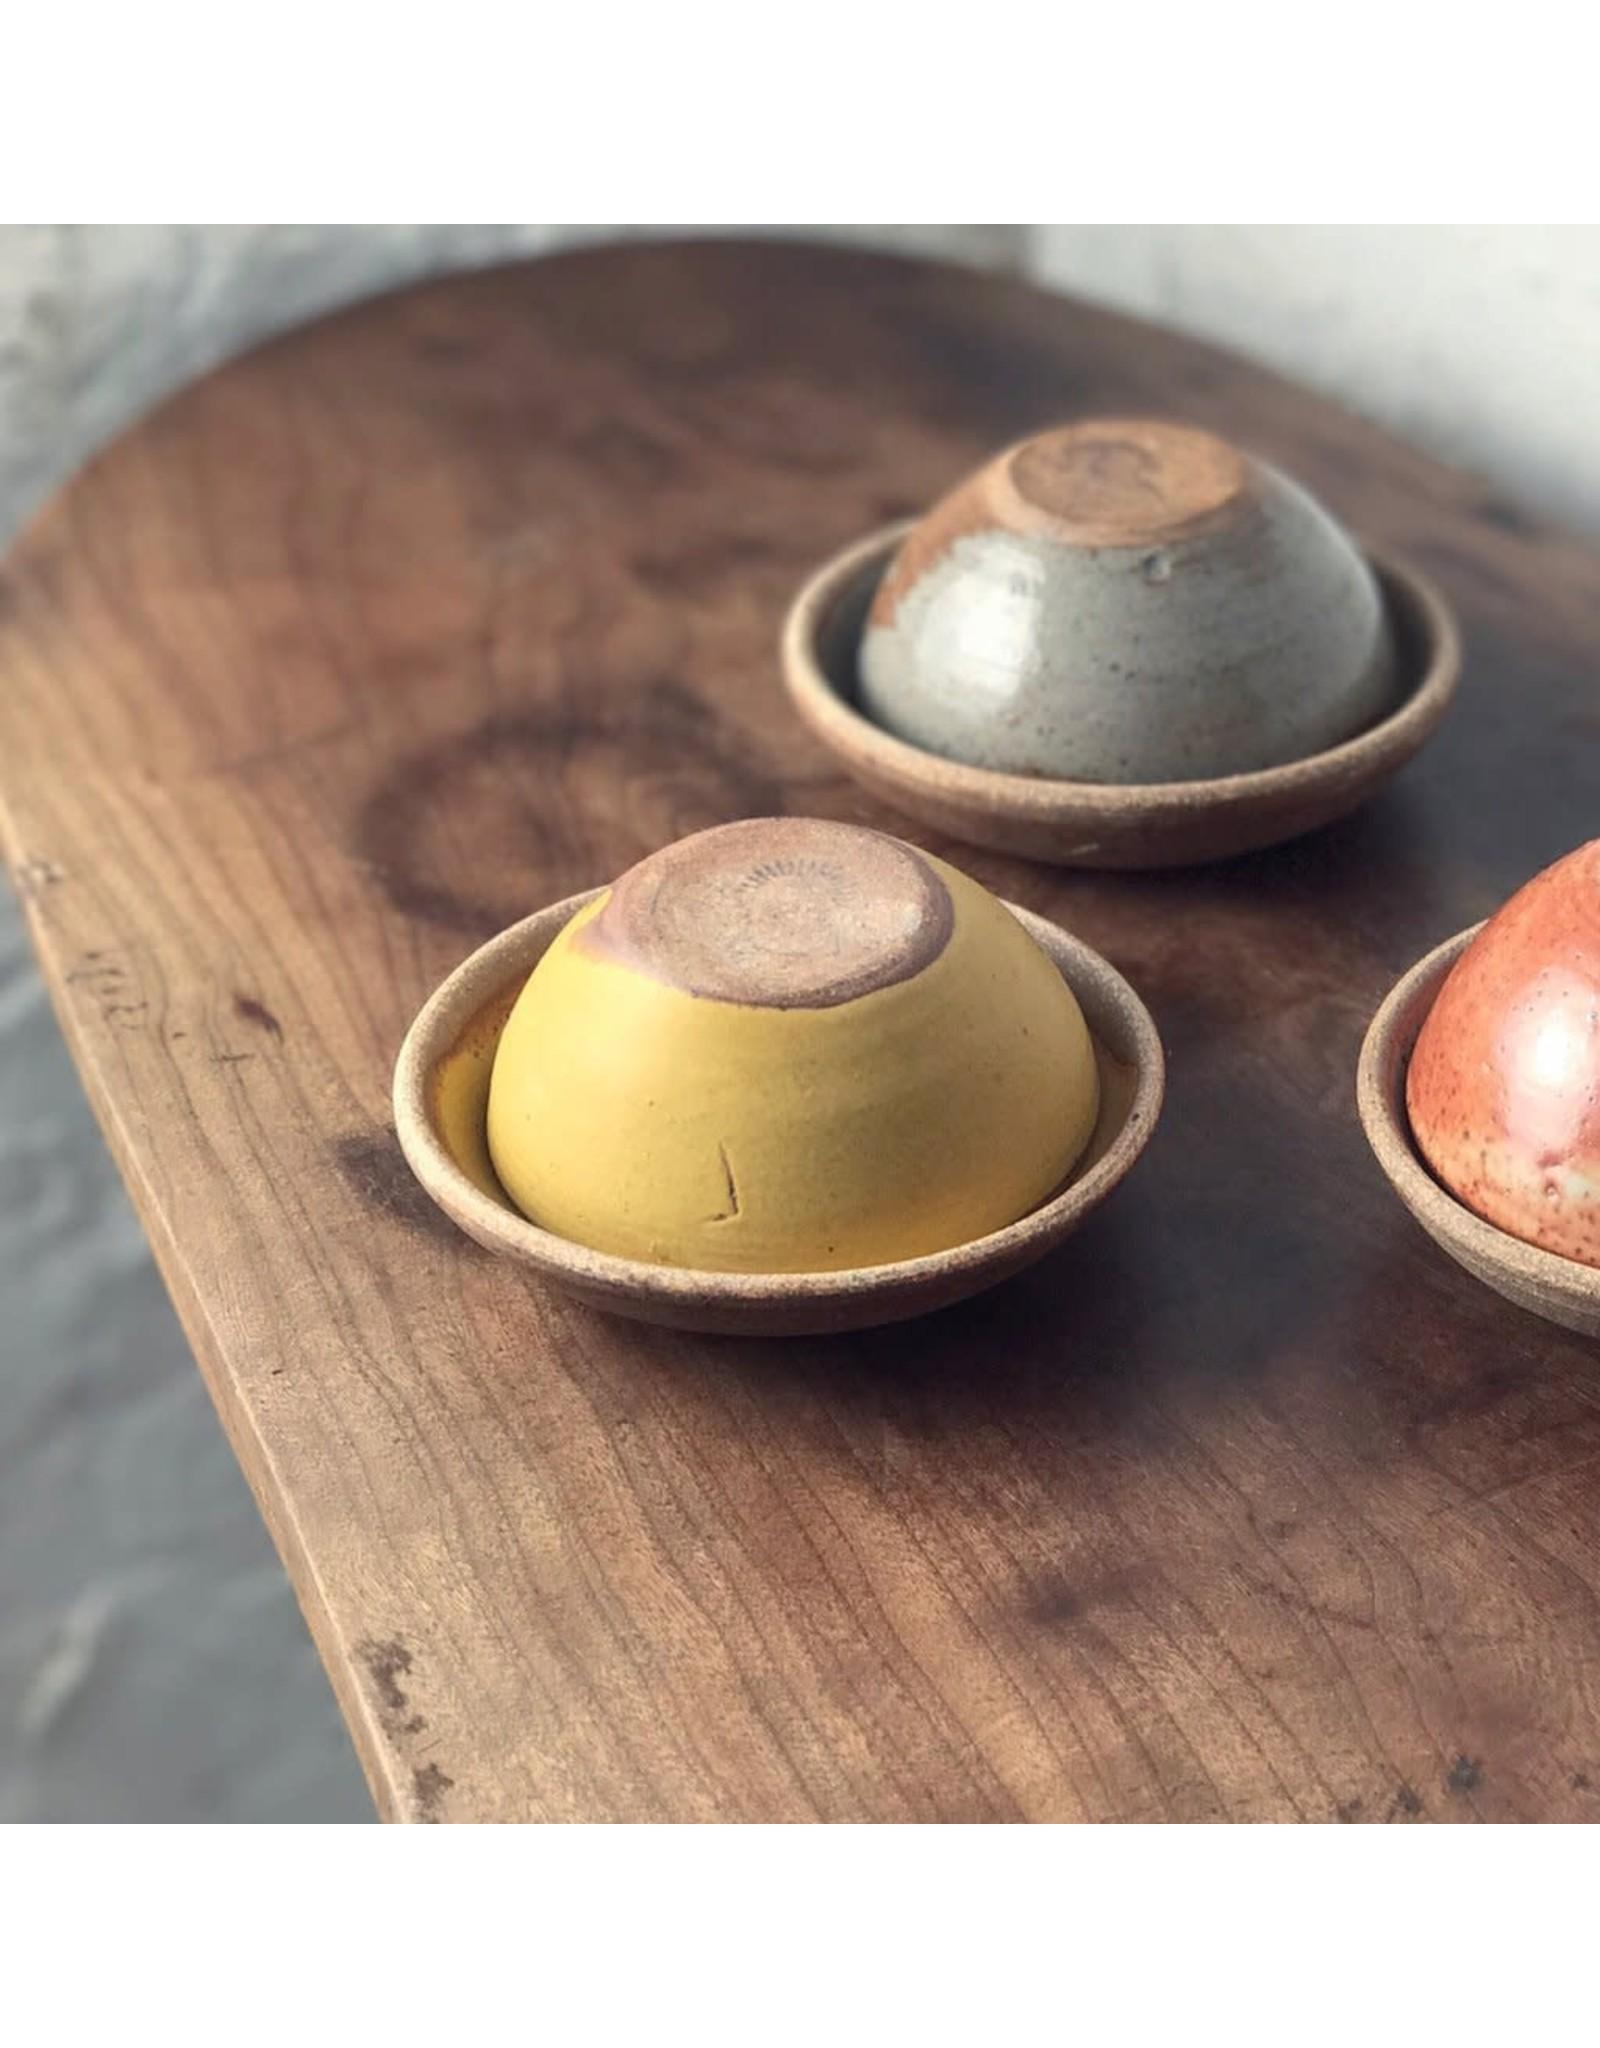 Incausa Stoneware Smudge Bowl - Woo Yellow